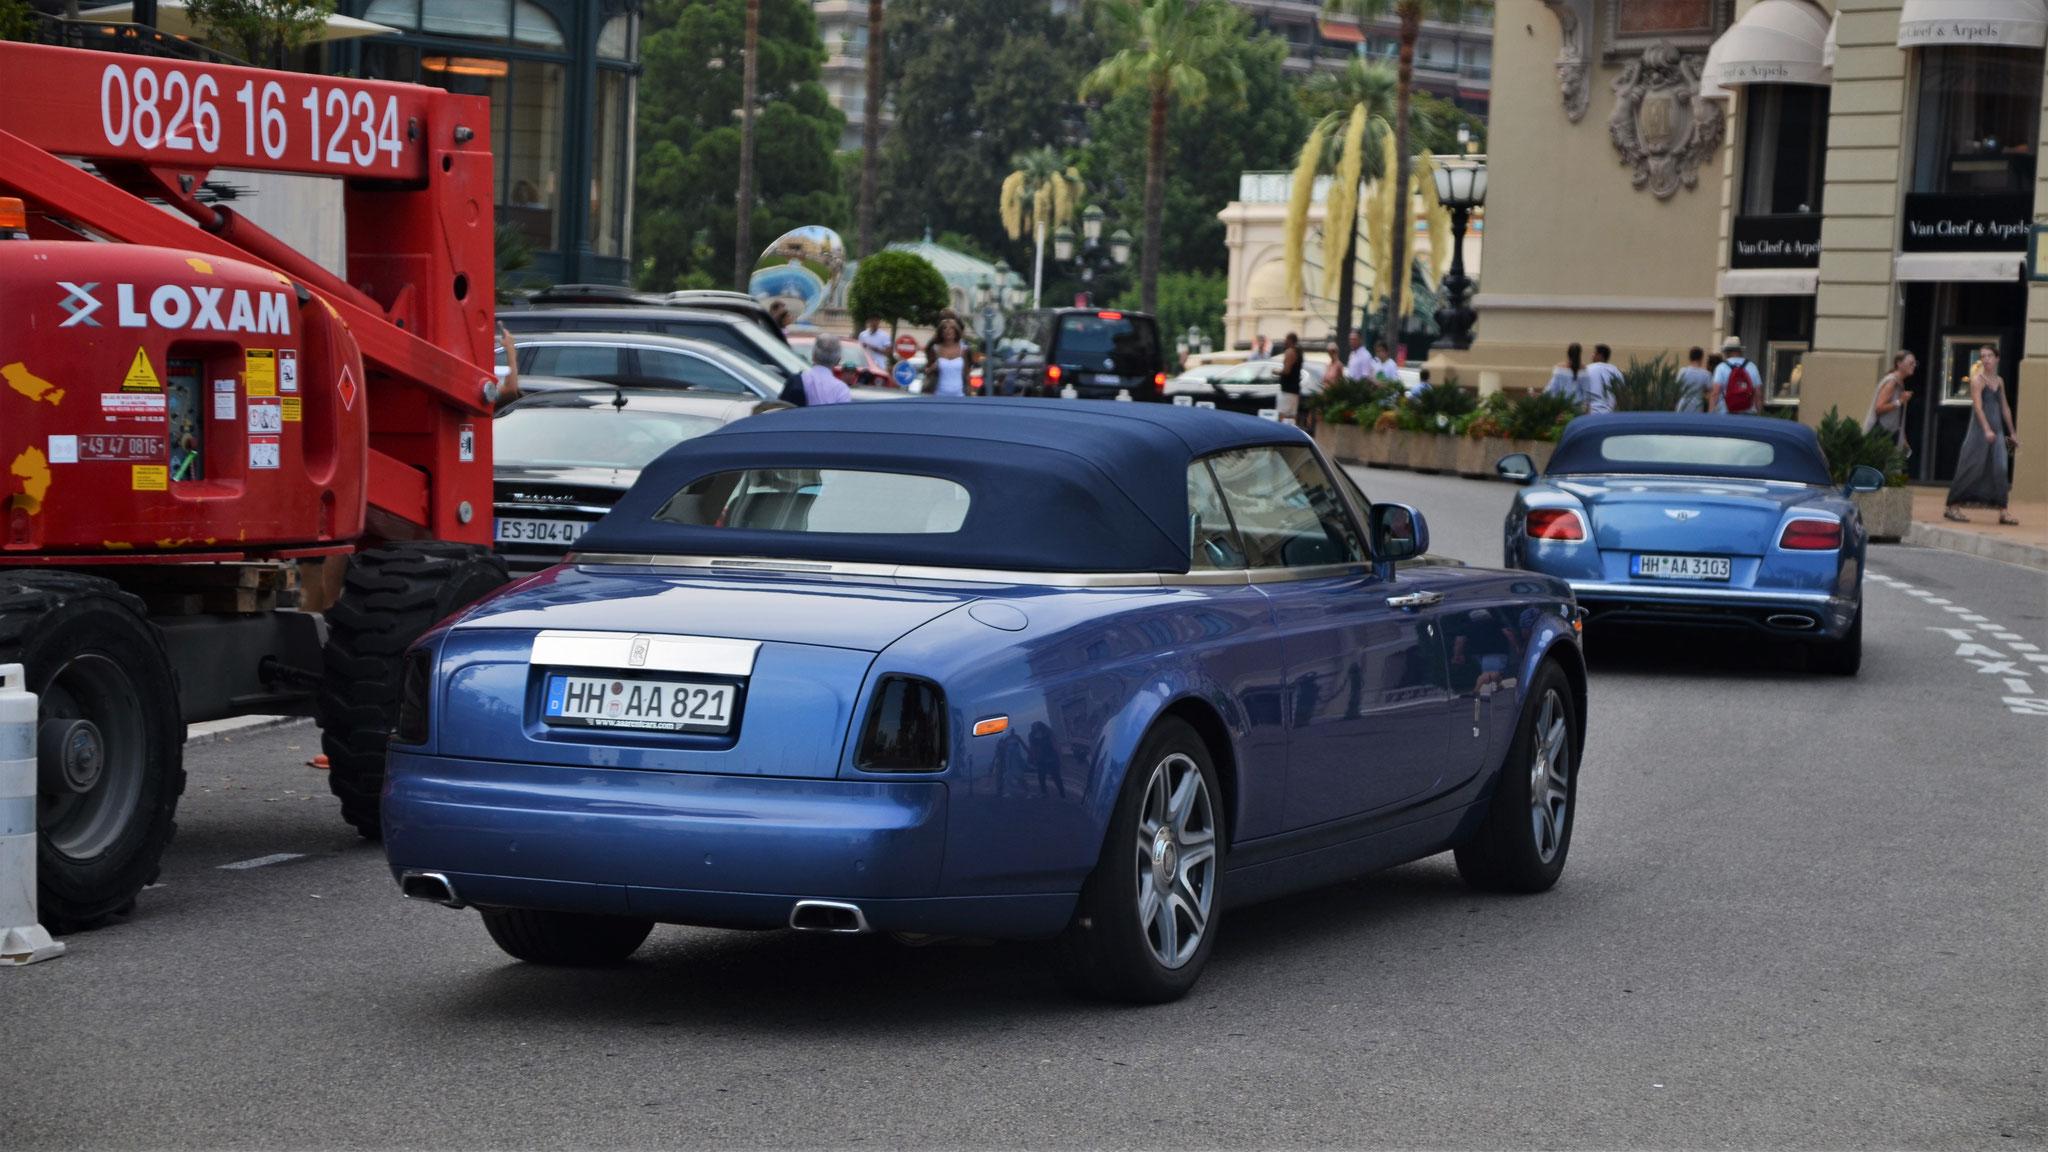 Rolls Royce Drophead - HH-AA-821